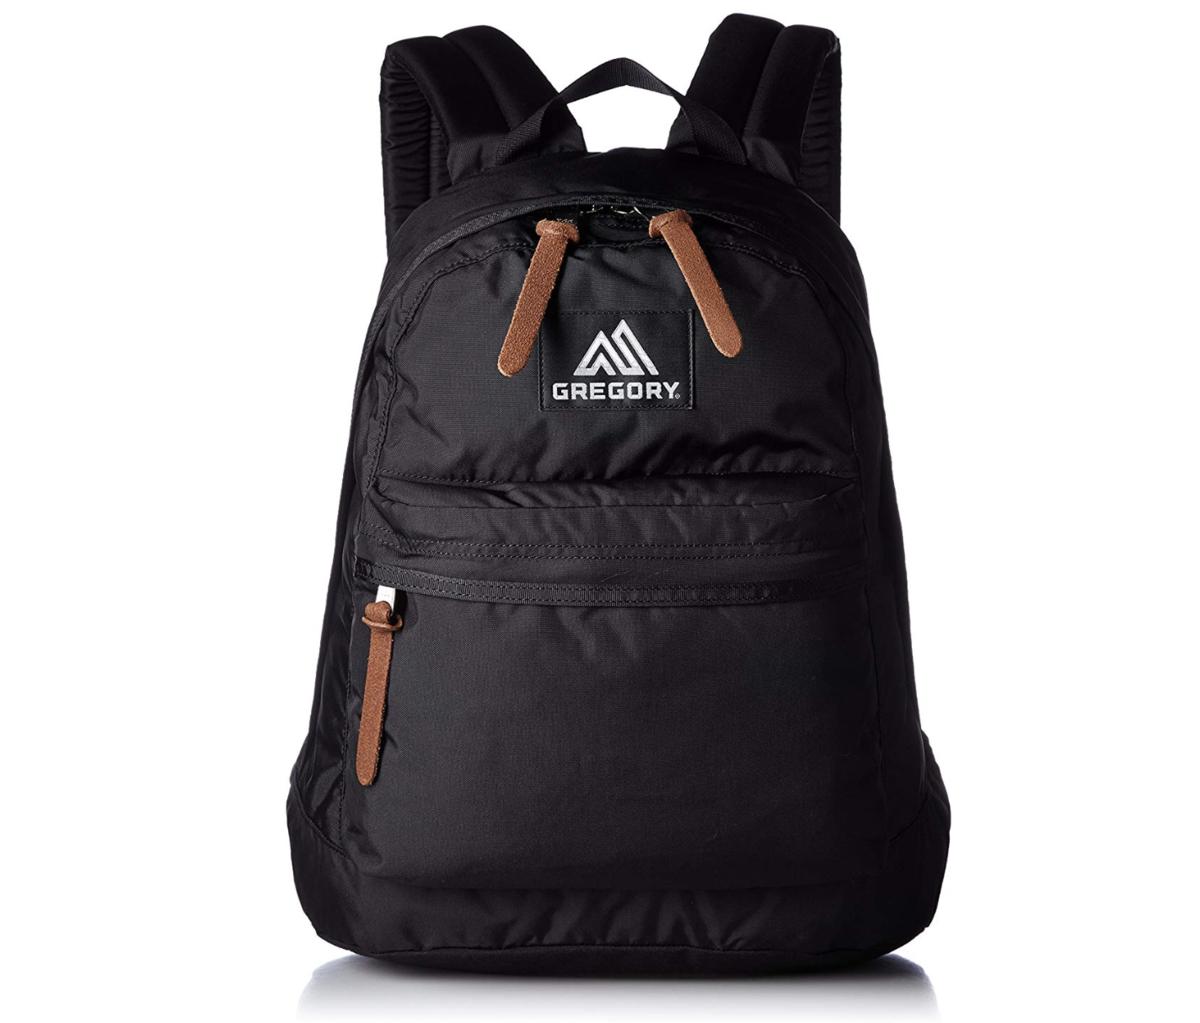 f:id:thebackpack:20190620220949p:plain